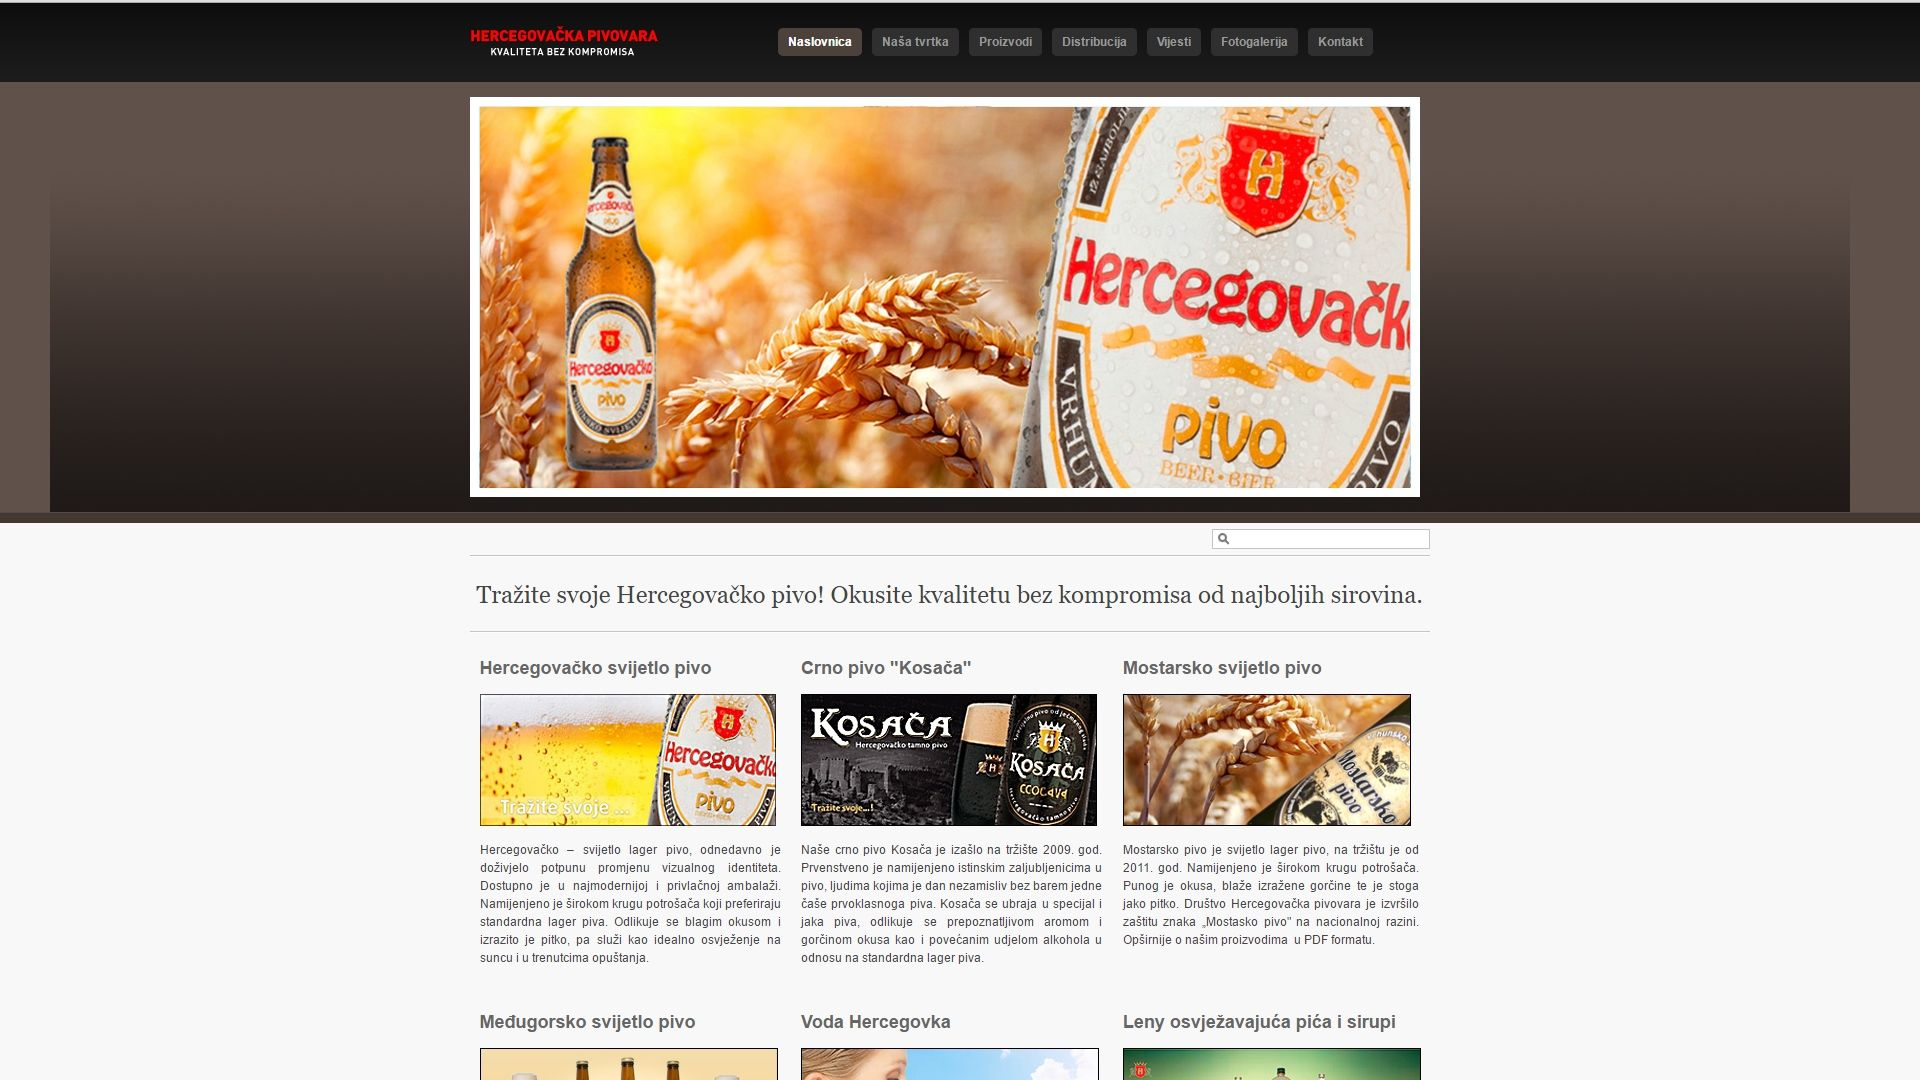 hercegovacko pivo